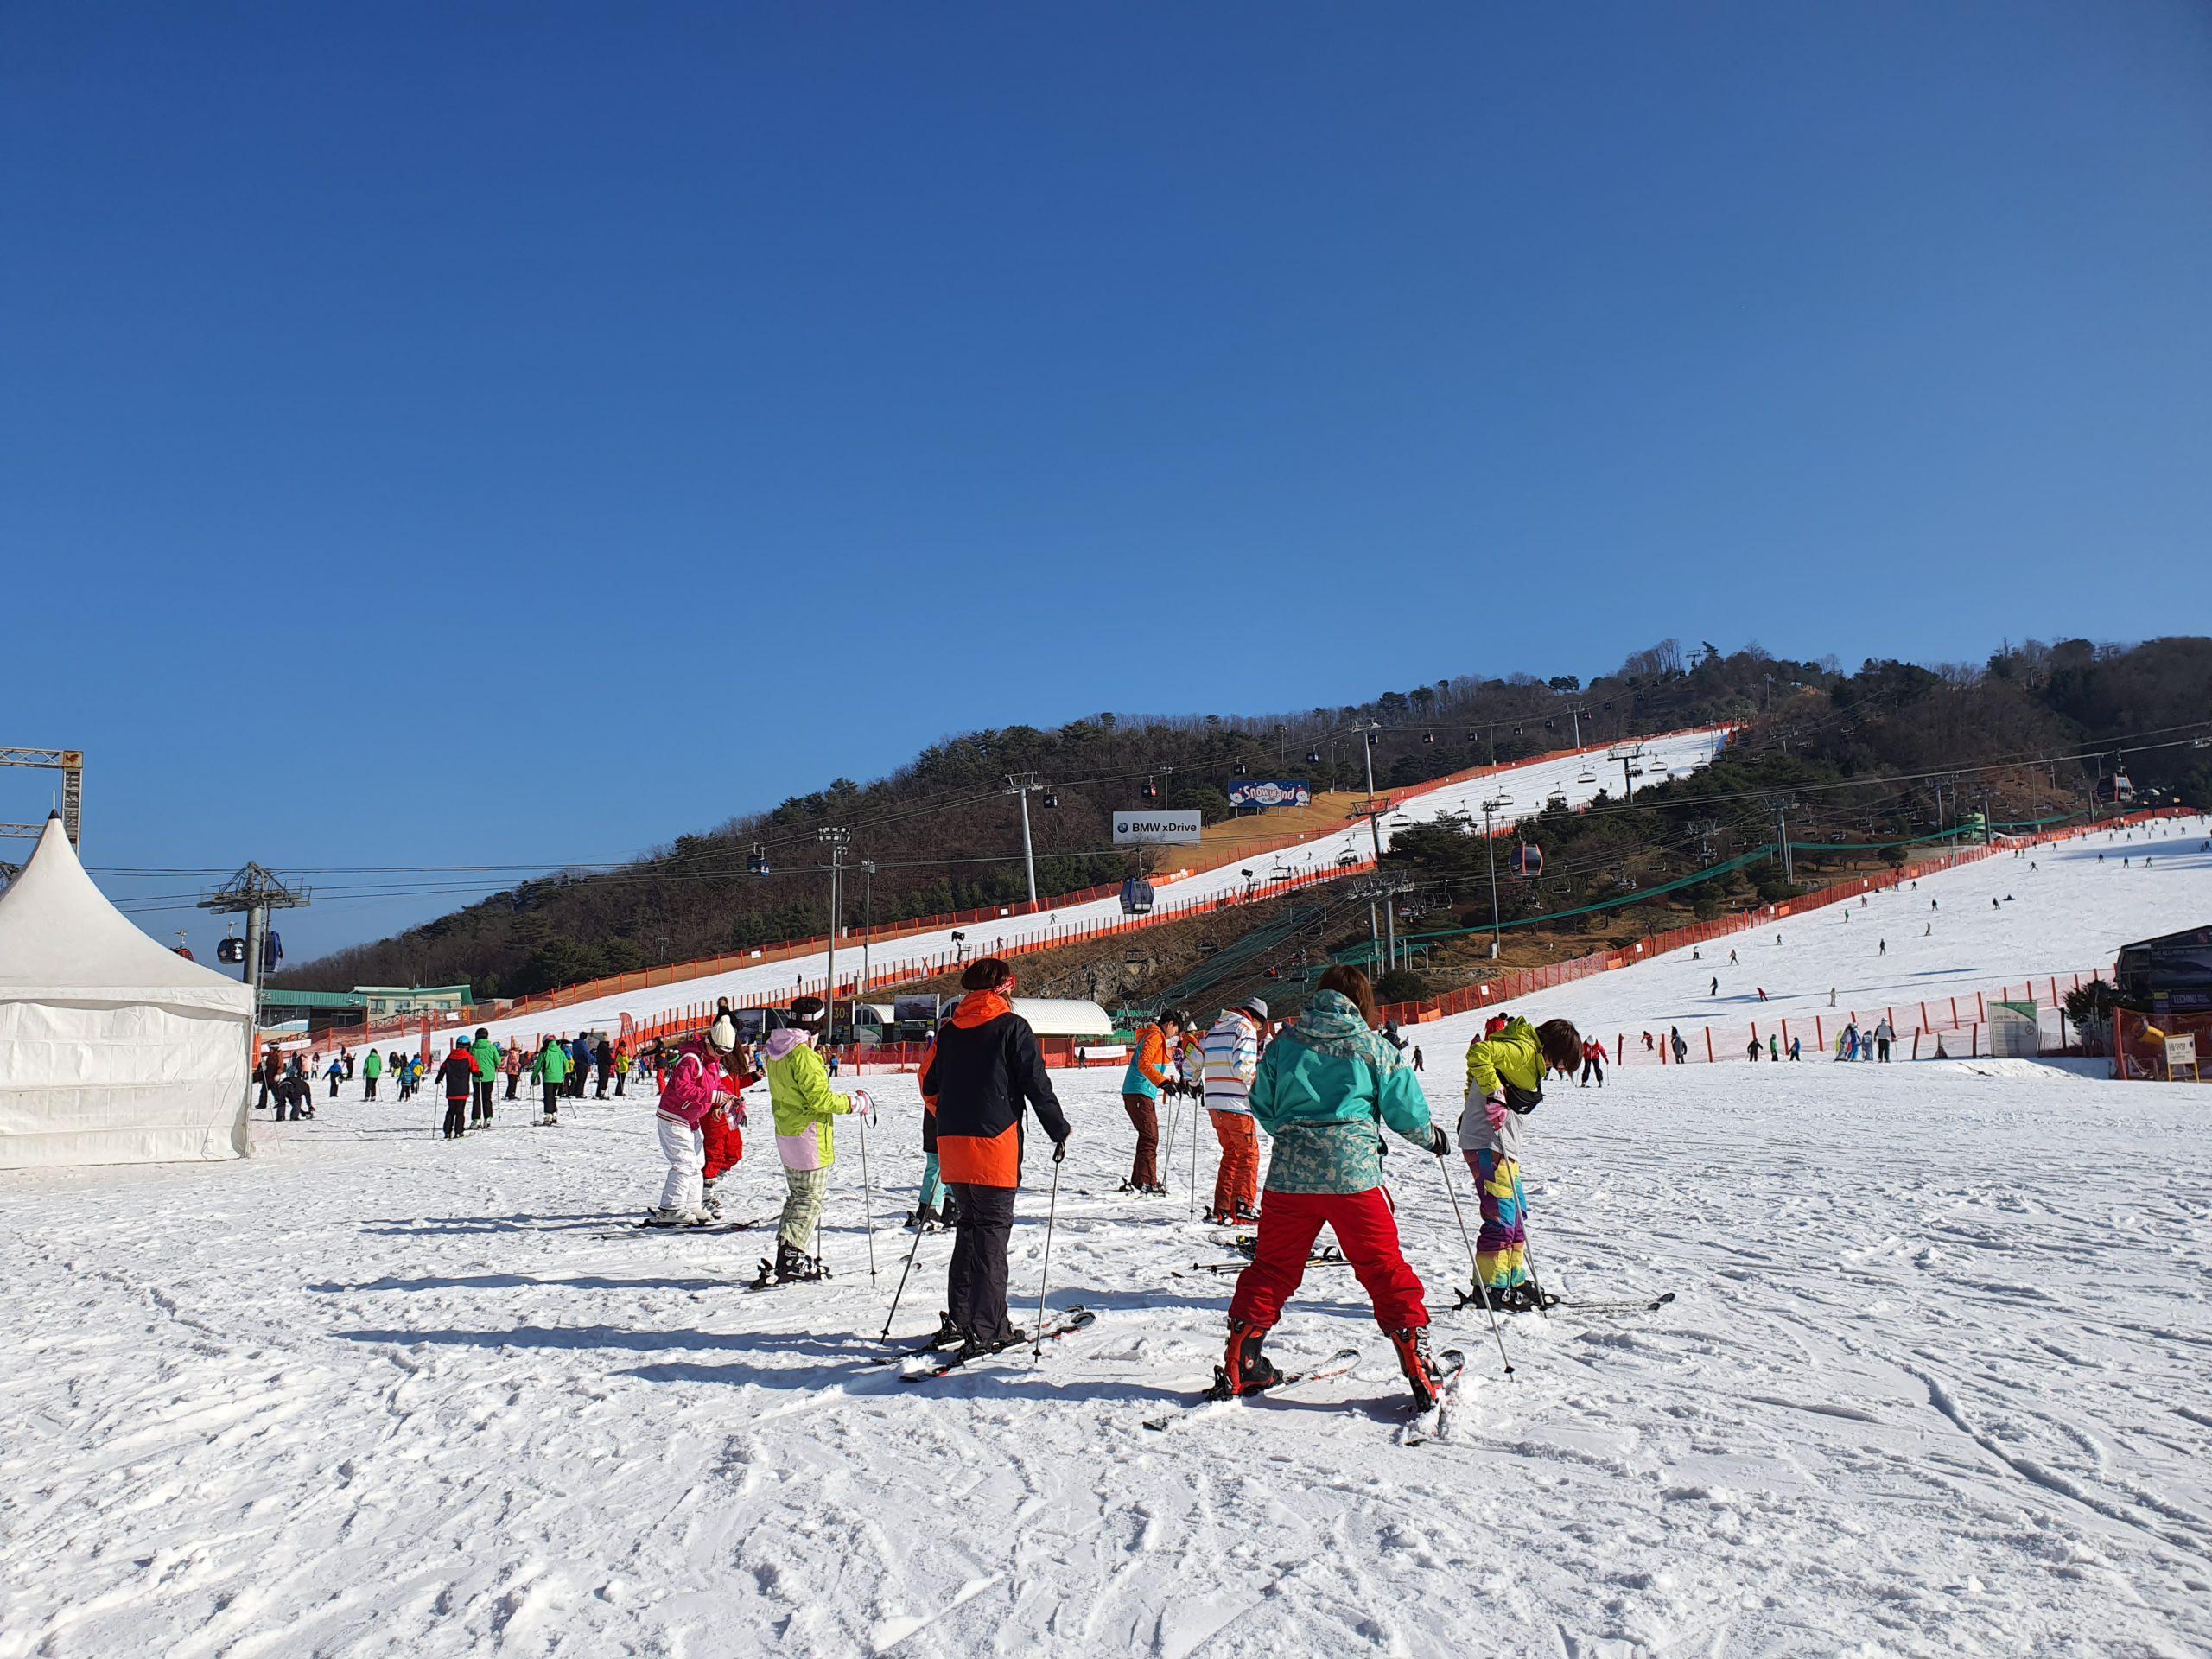 The Ultimate Guide to Vivaldi Park Ski Resort (2) Food, Restaurants